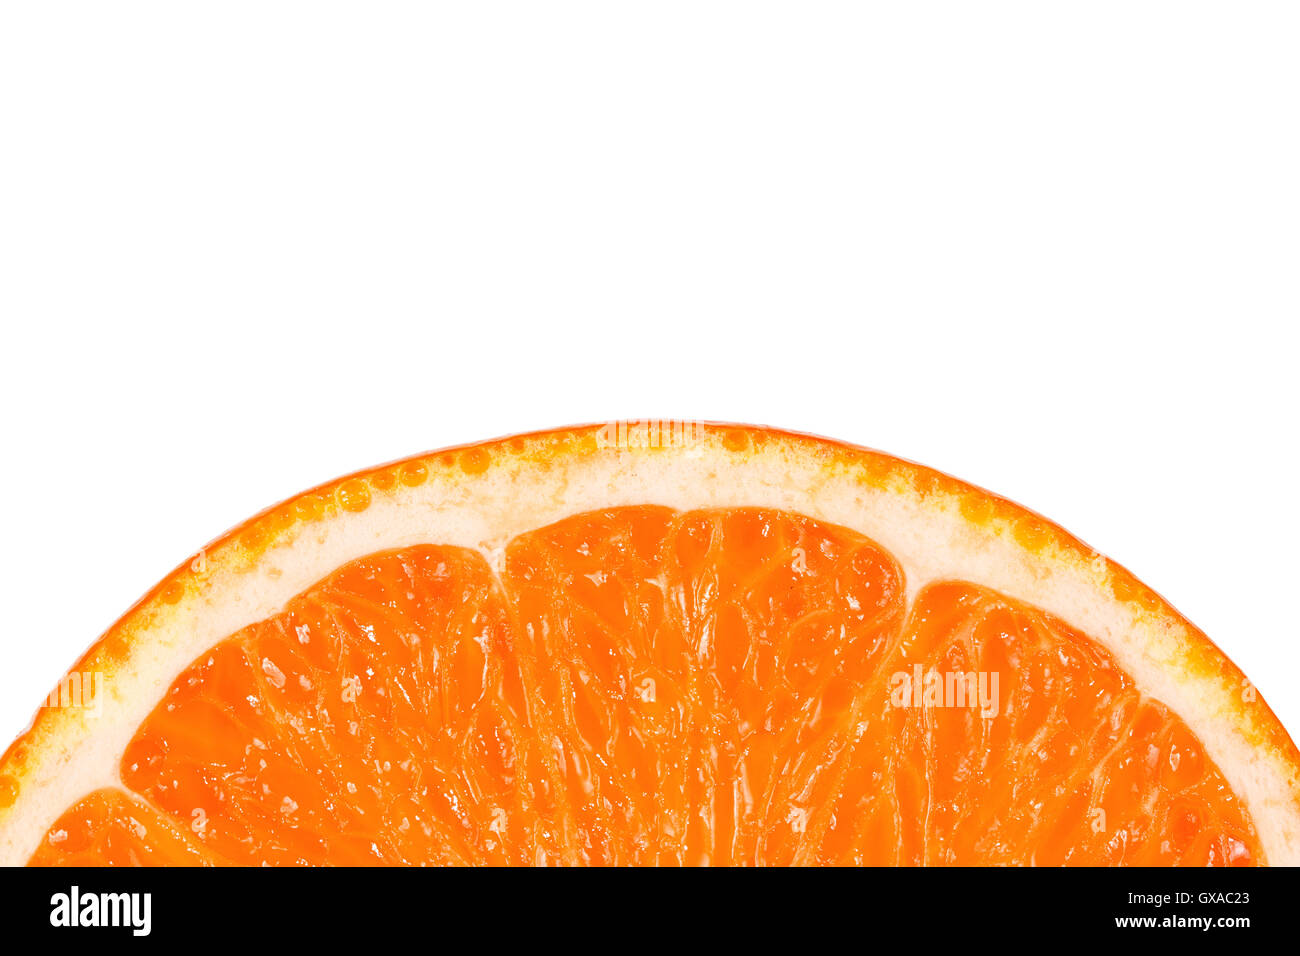 Slice of juicy tropical fruit grapefruit on a white background - Stock Image